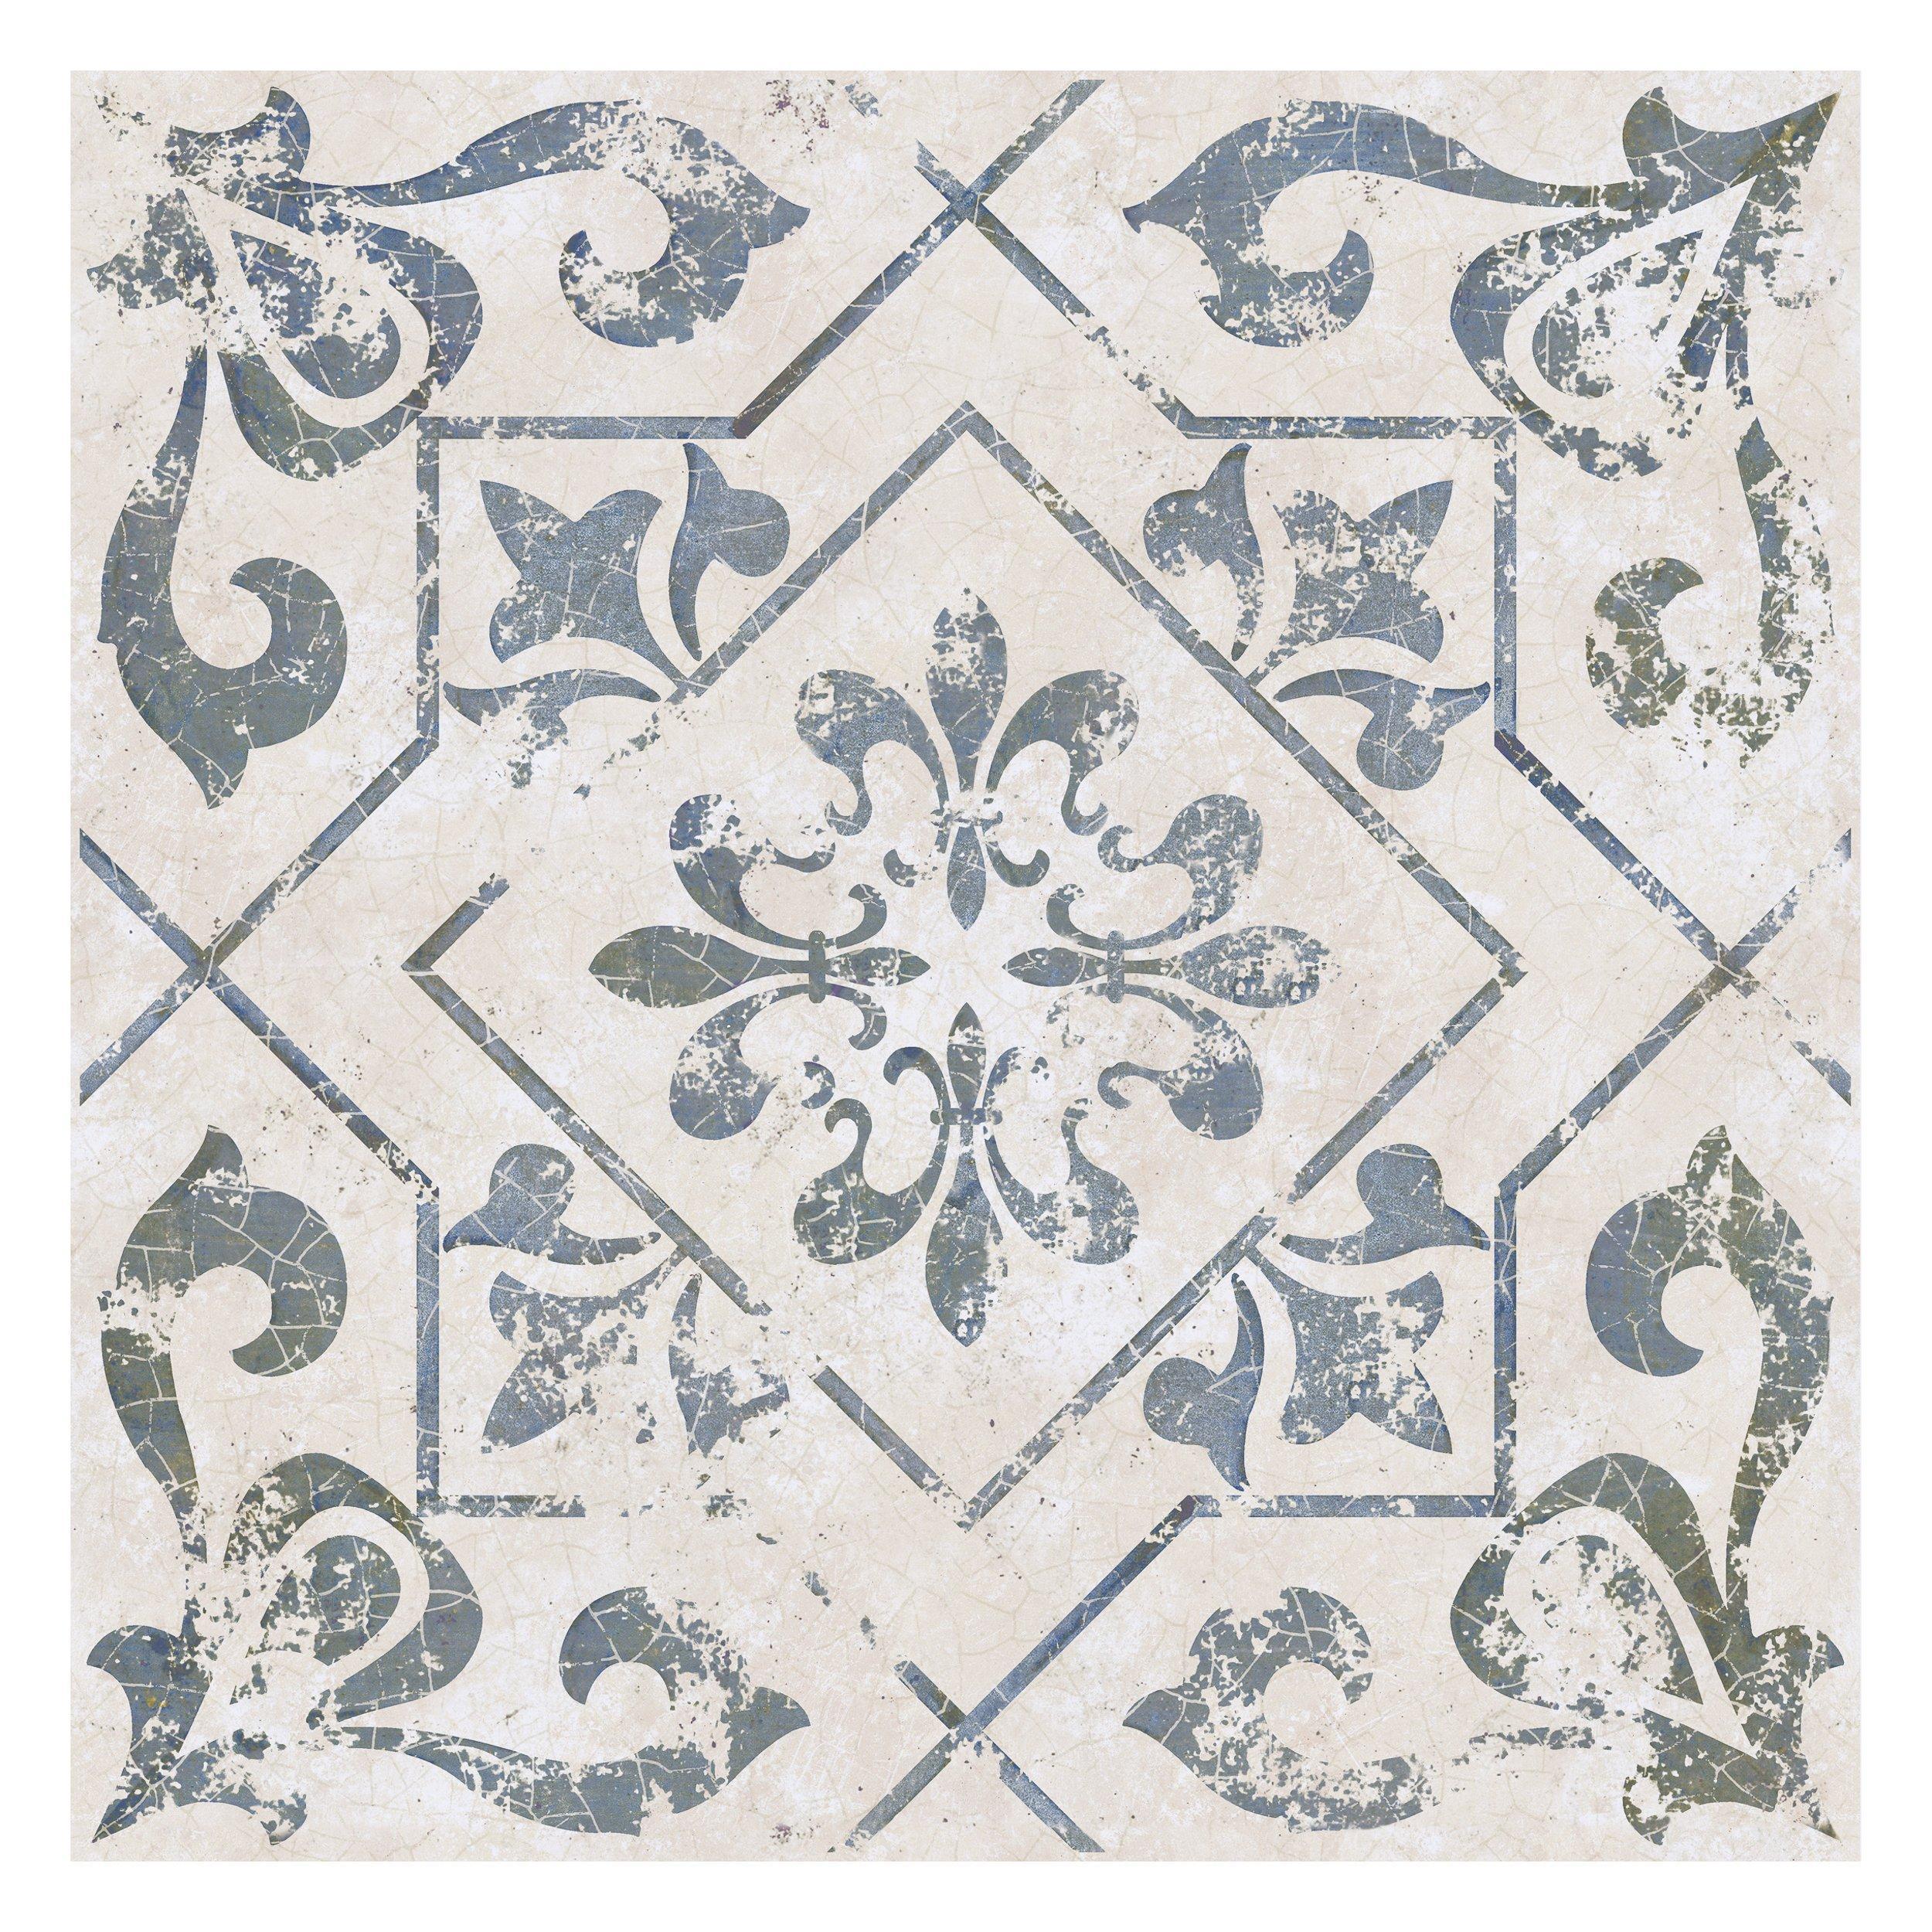 provenzia decorative mix pattern